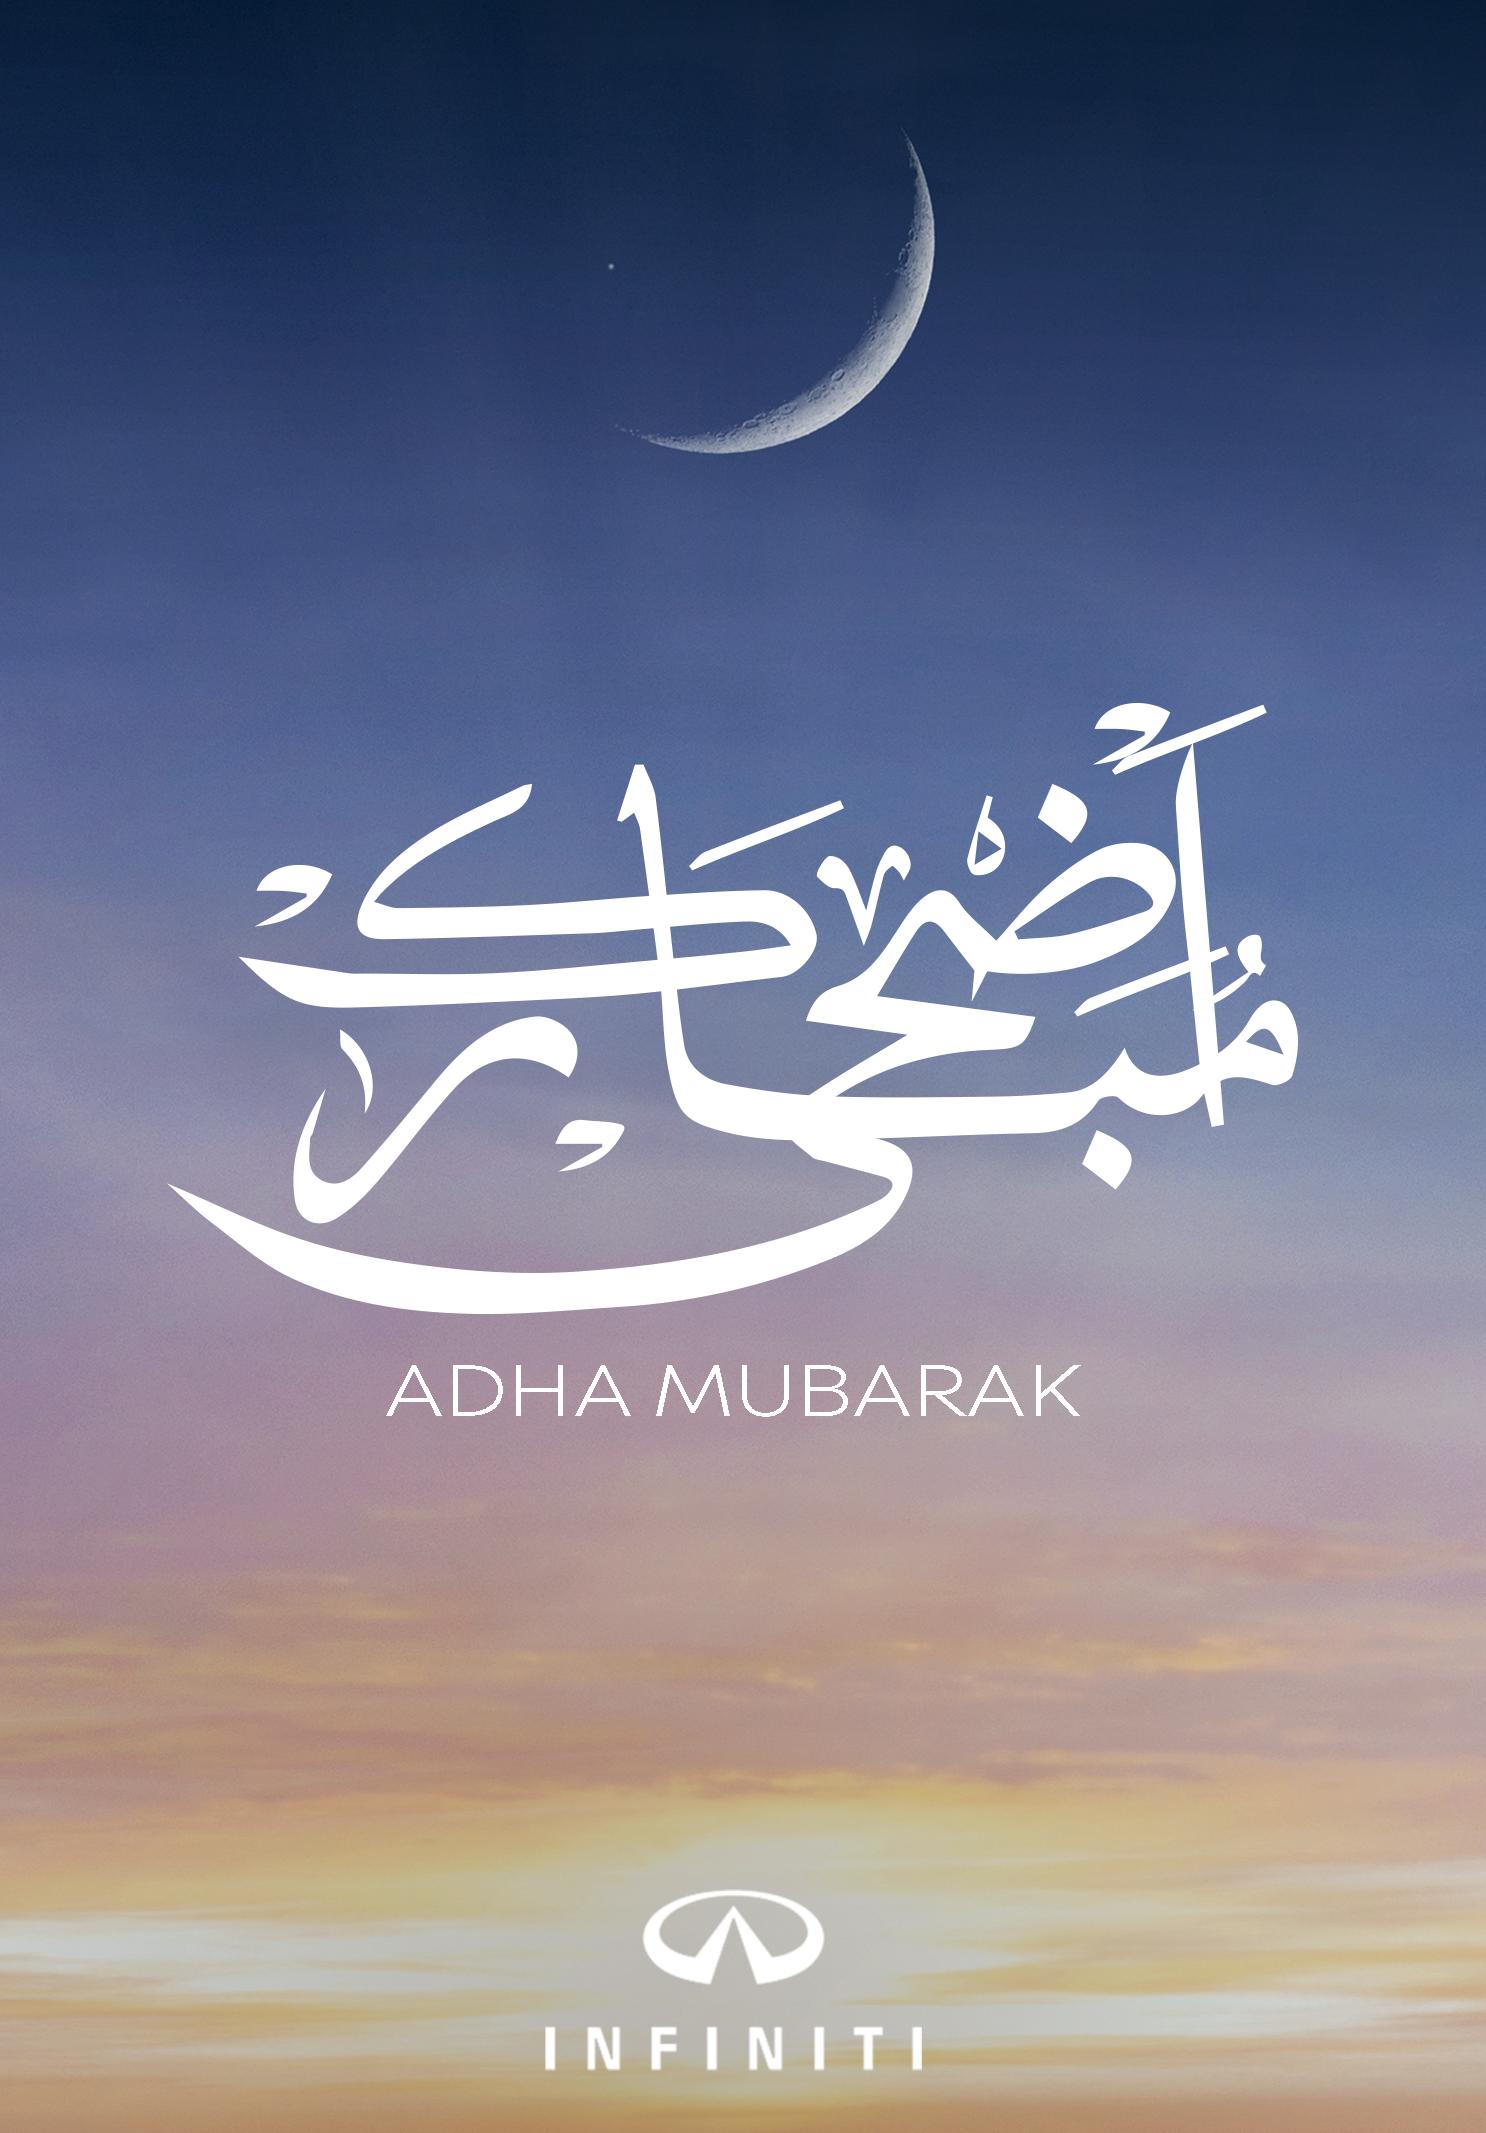 INFINITI Oman extends Eid Al-Adha greetings